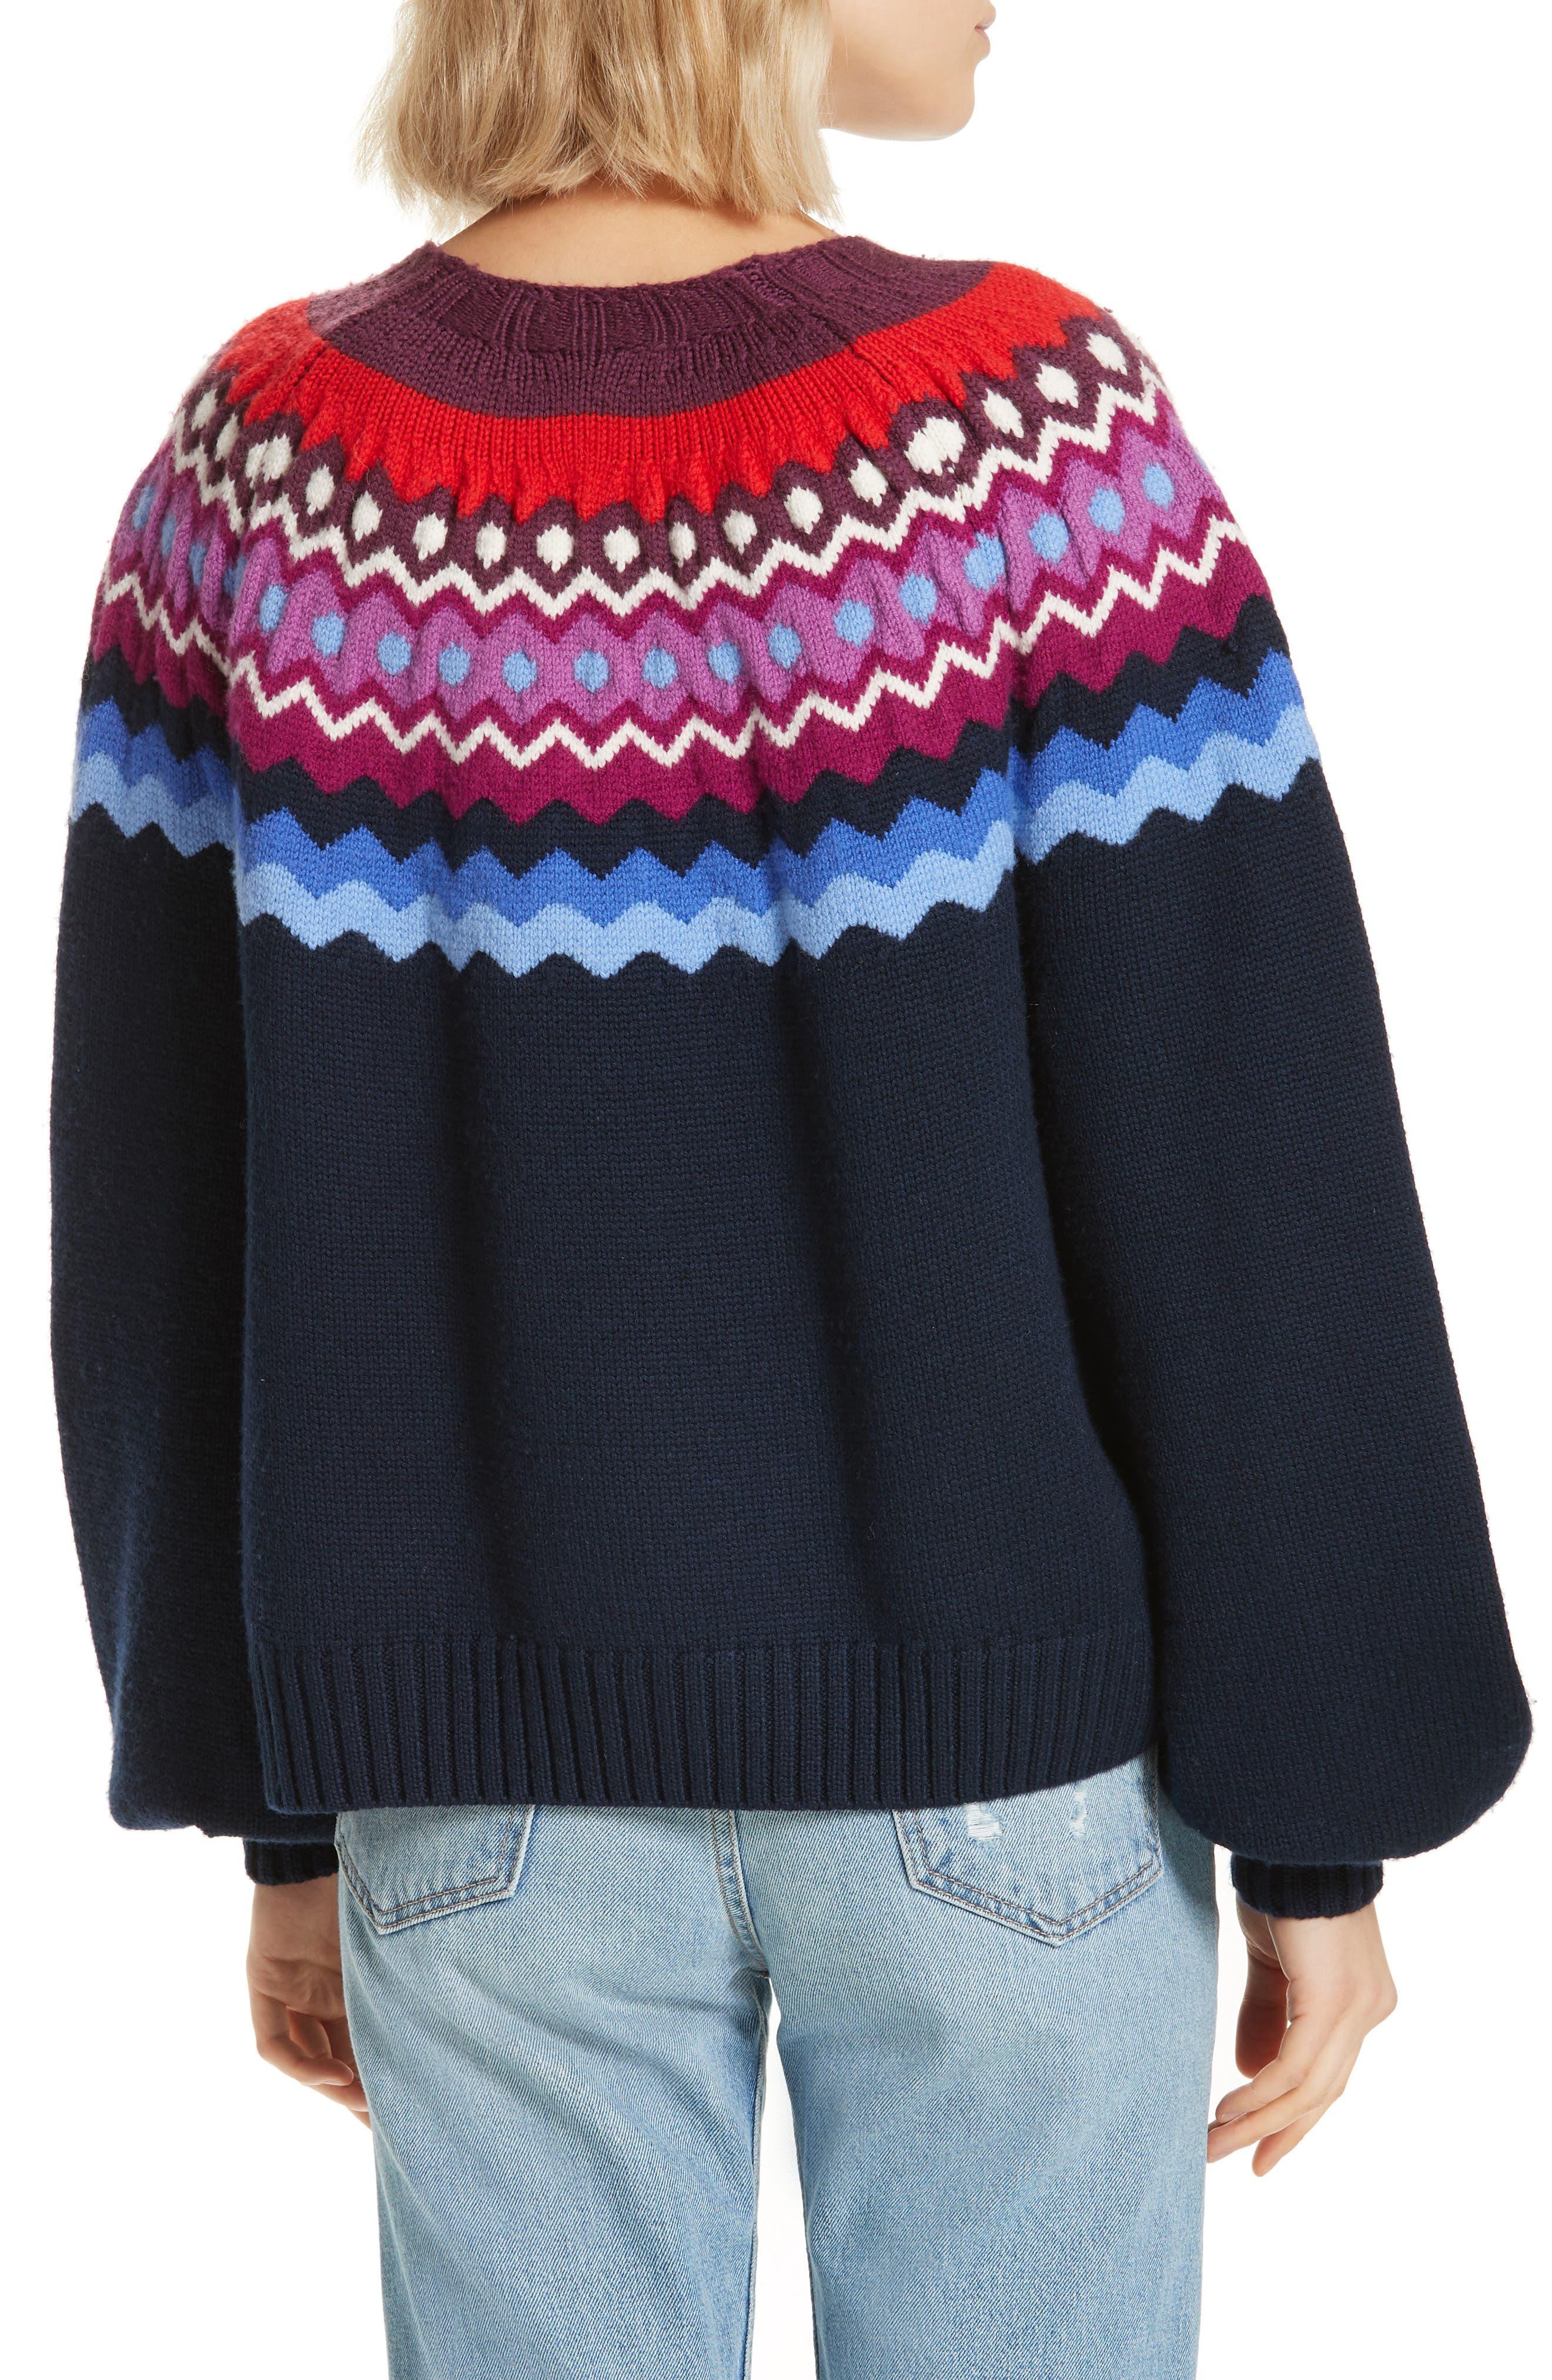 JOIE,                             Karenya Sweater,                             Alternate thumbnail 2, color,                             410